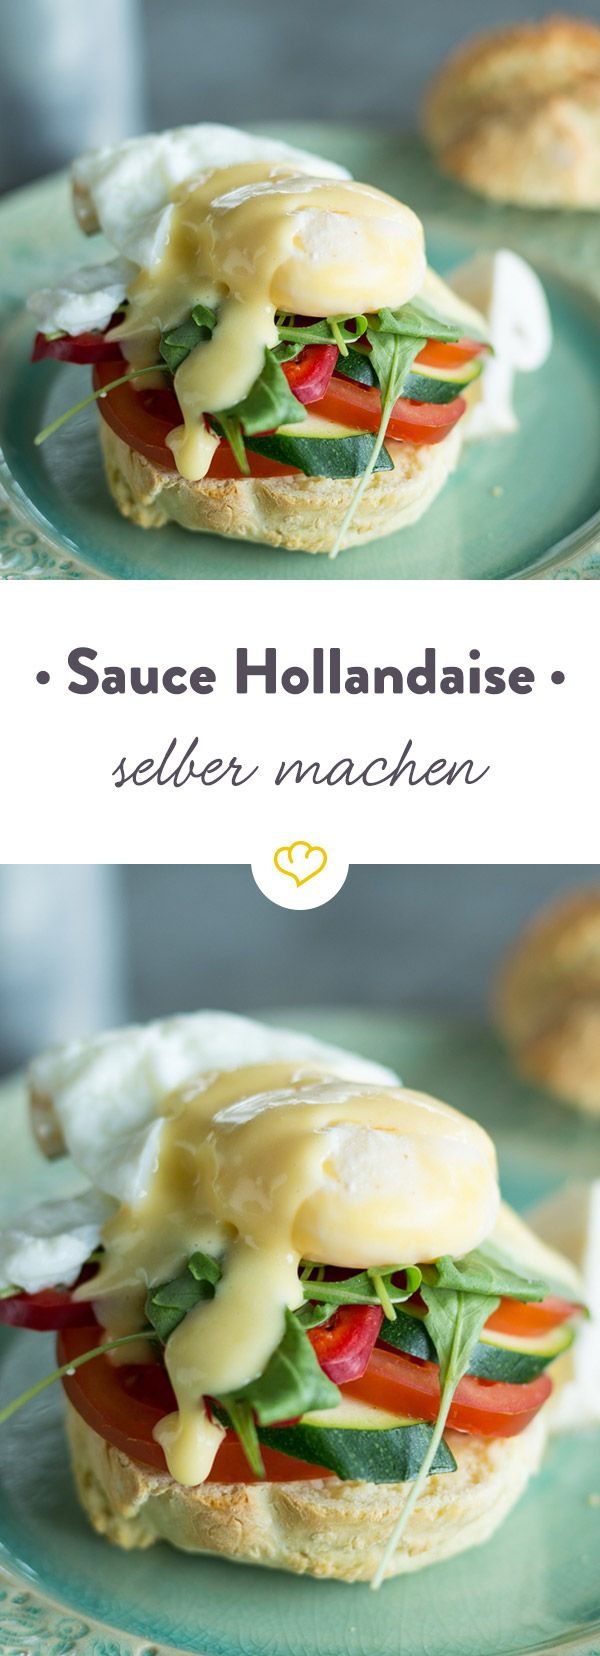 sauce hollandaise recipe sauces cooking recipes. Black Bedroom Furniture Sets. Home Design Ideas